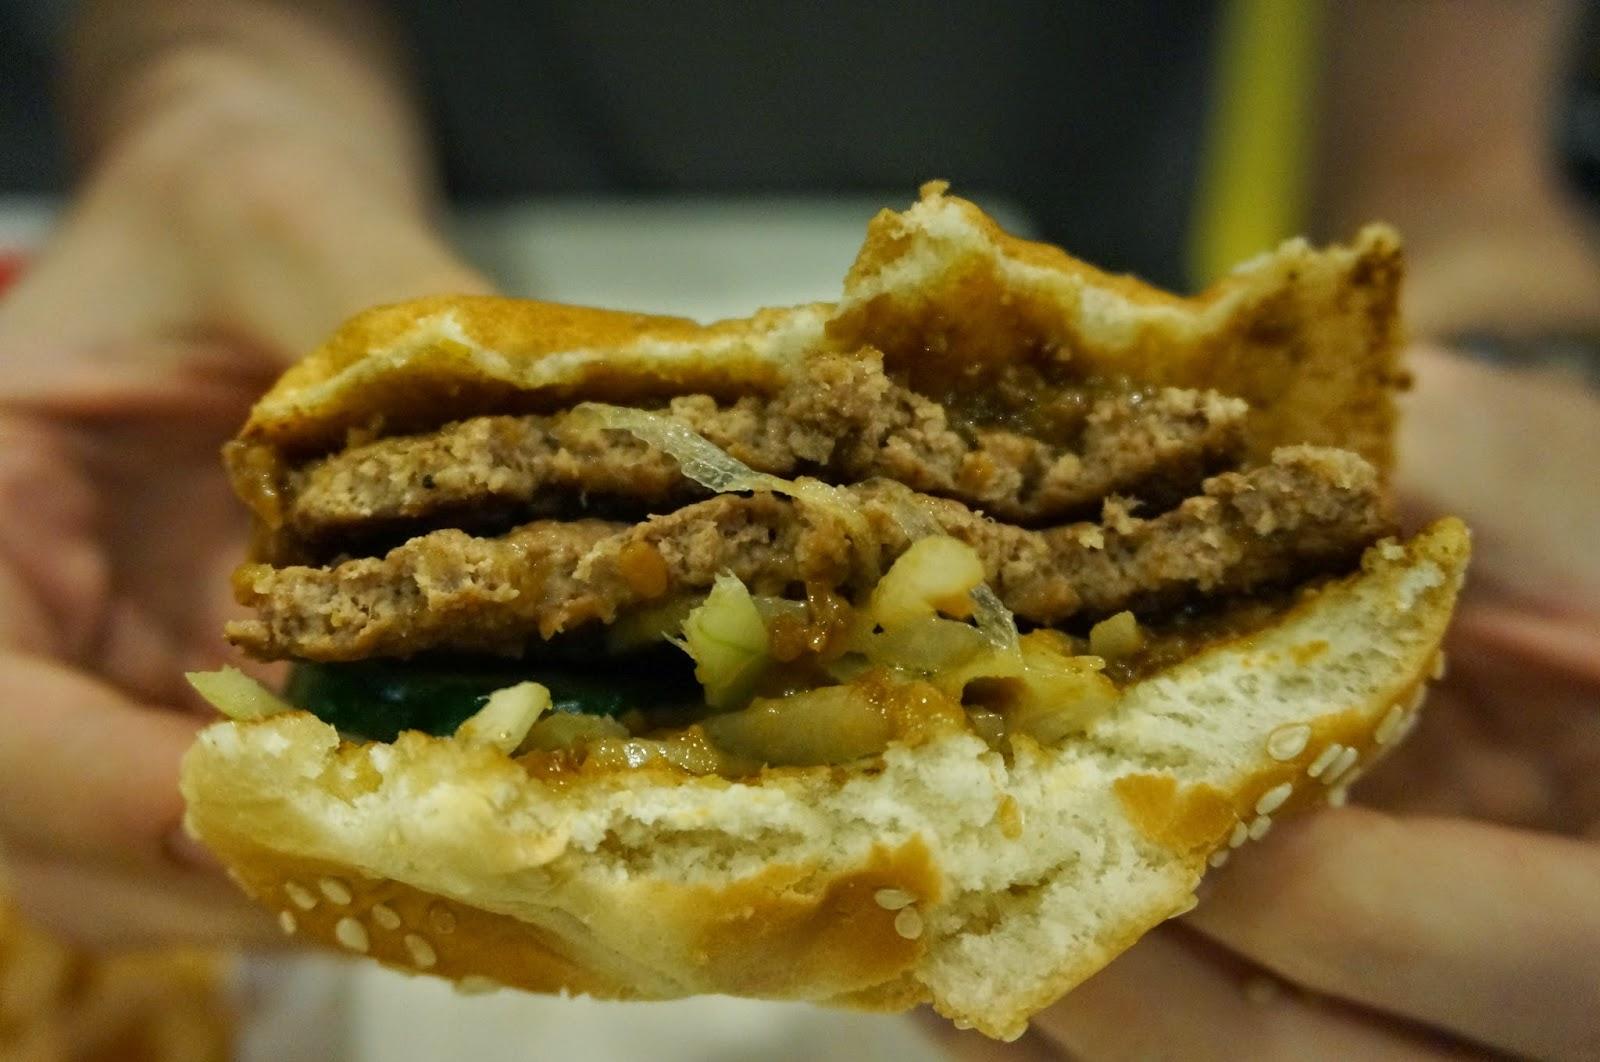 ... World: Shiok Shiok Beef & Chicken Satay Burger - Singapore - July 2014